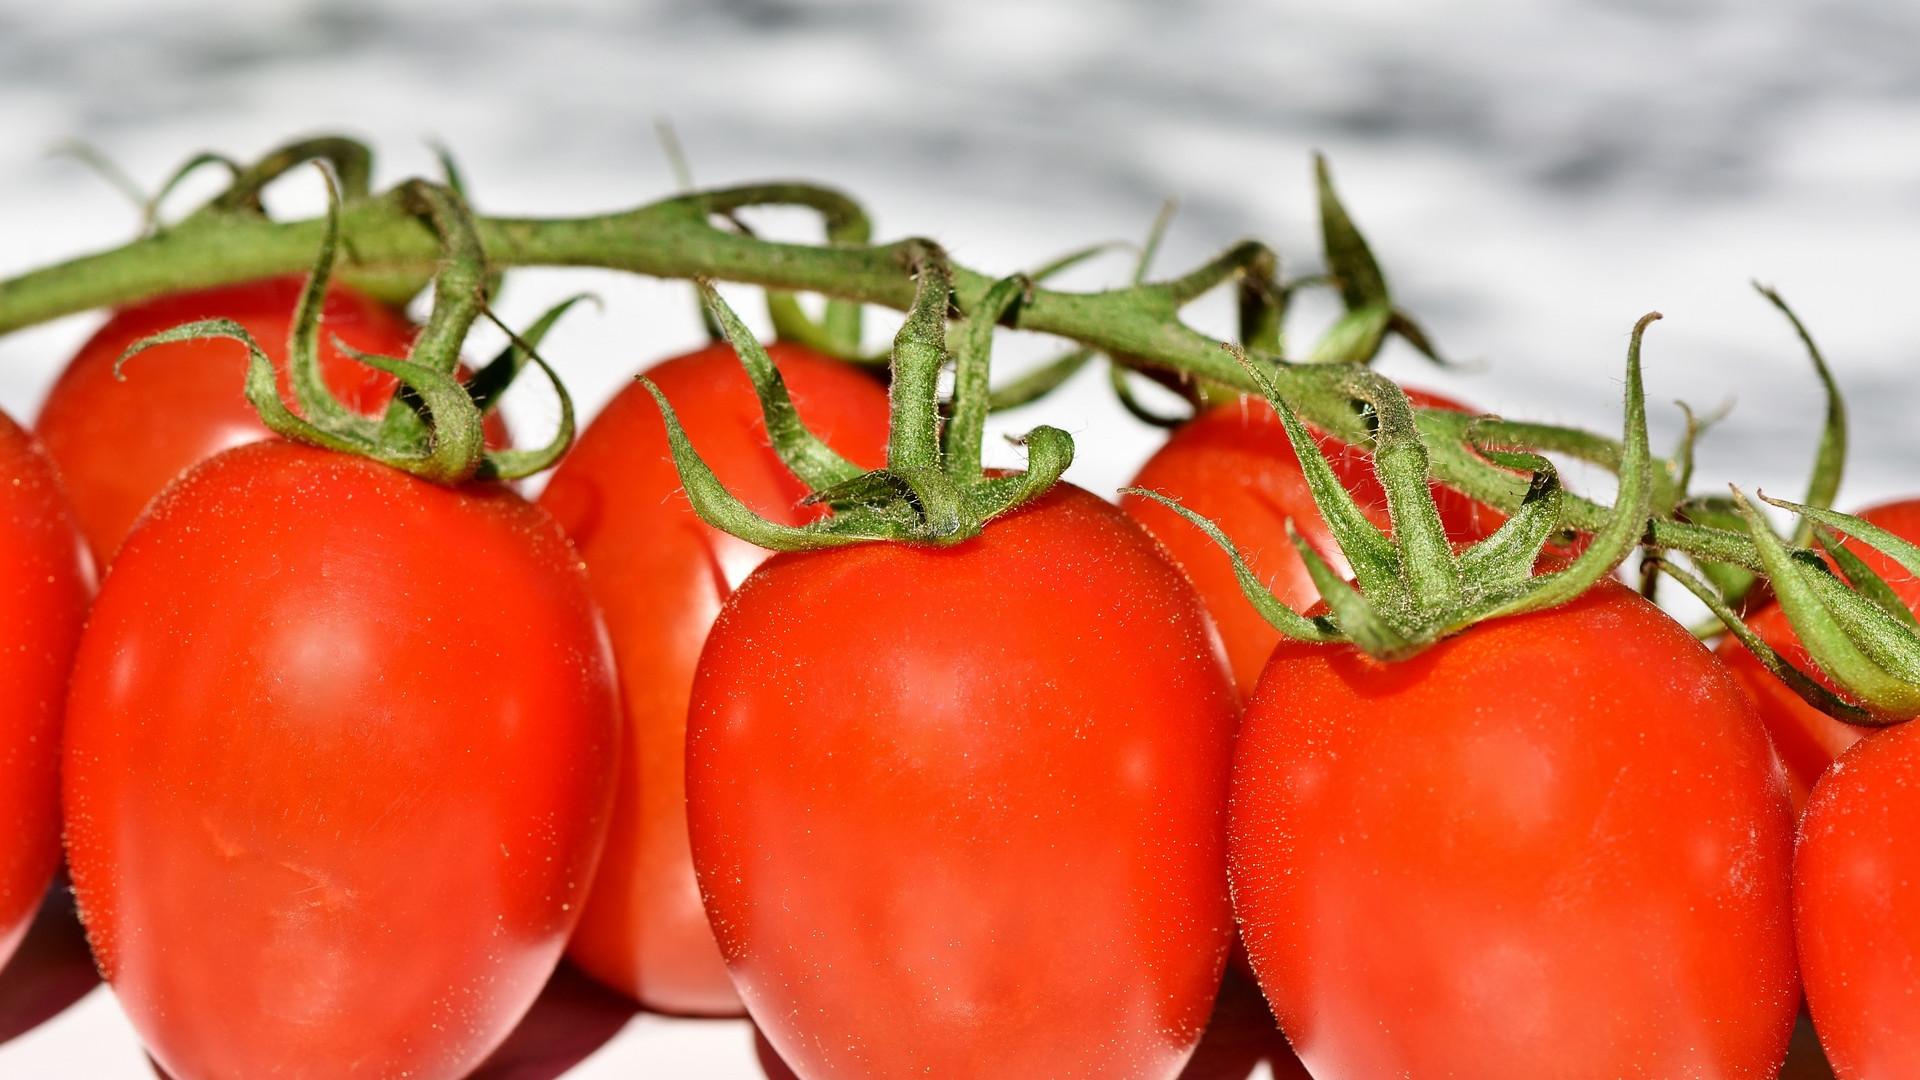 tomatoes-3480643_1920.jpg